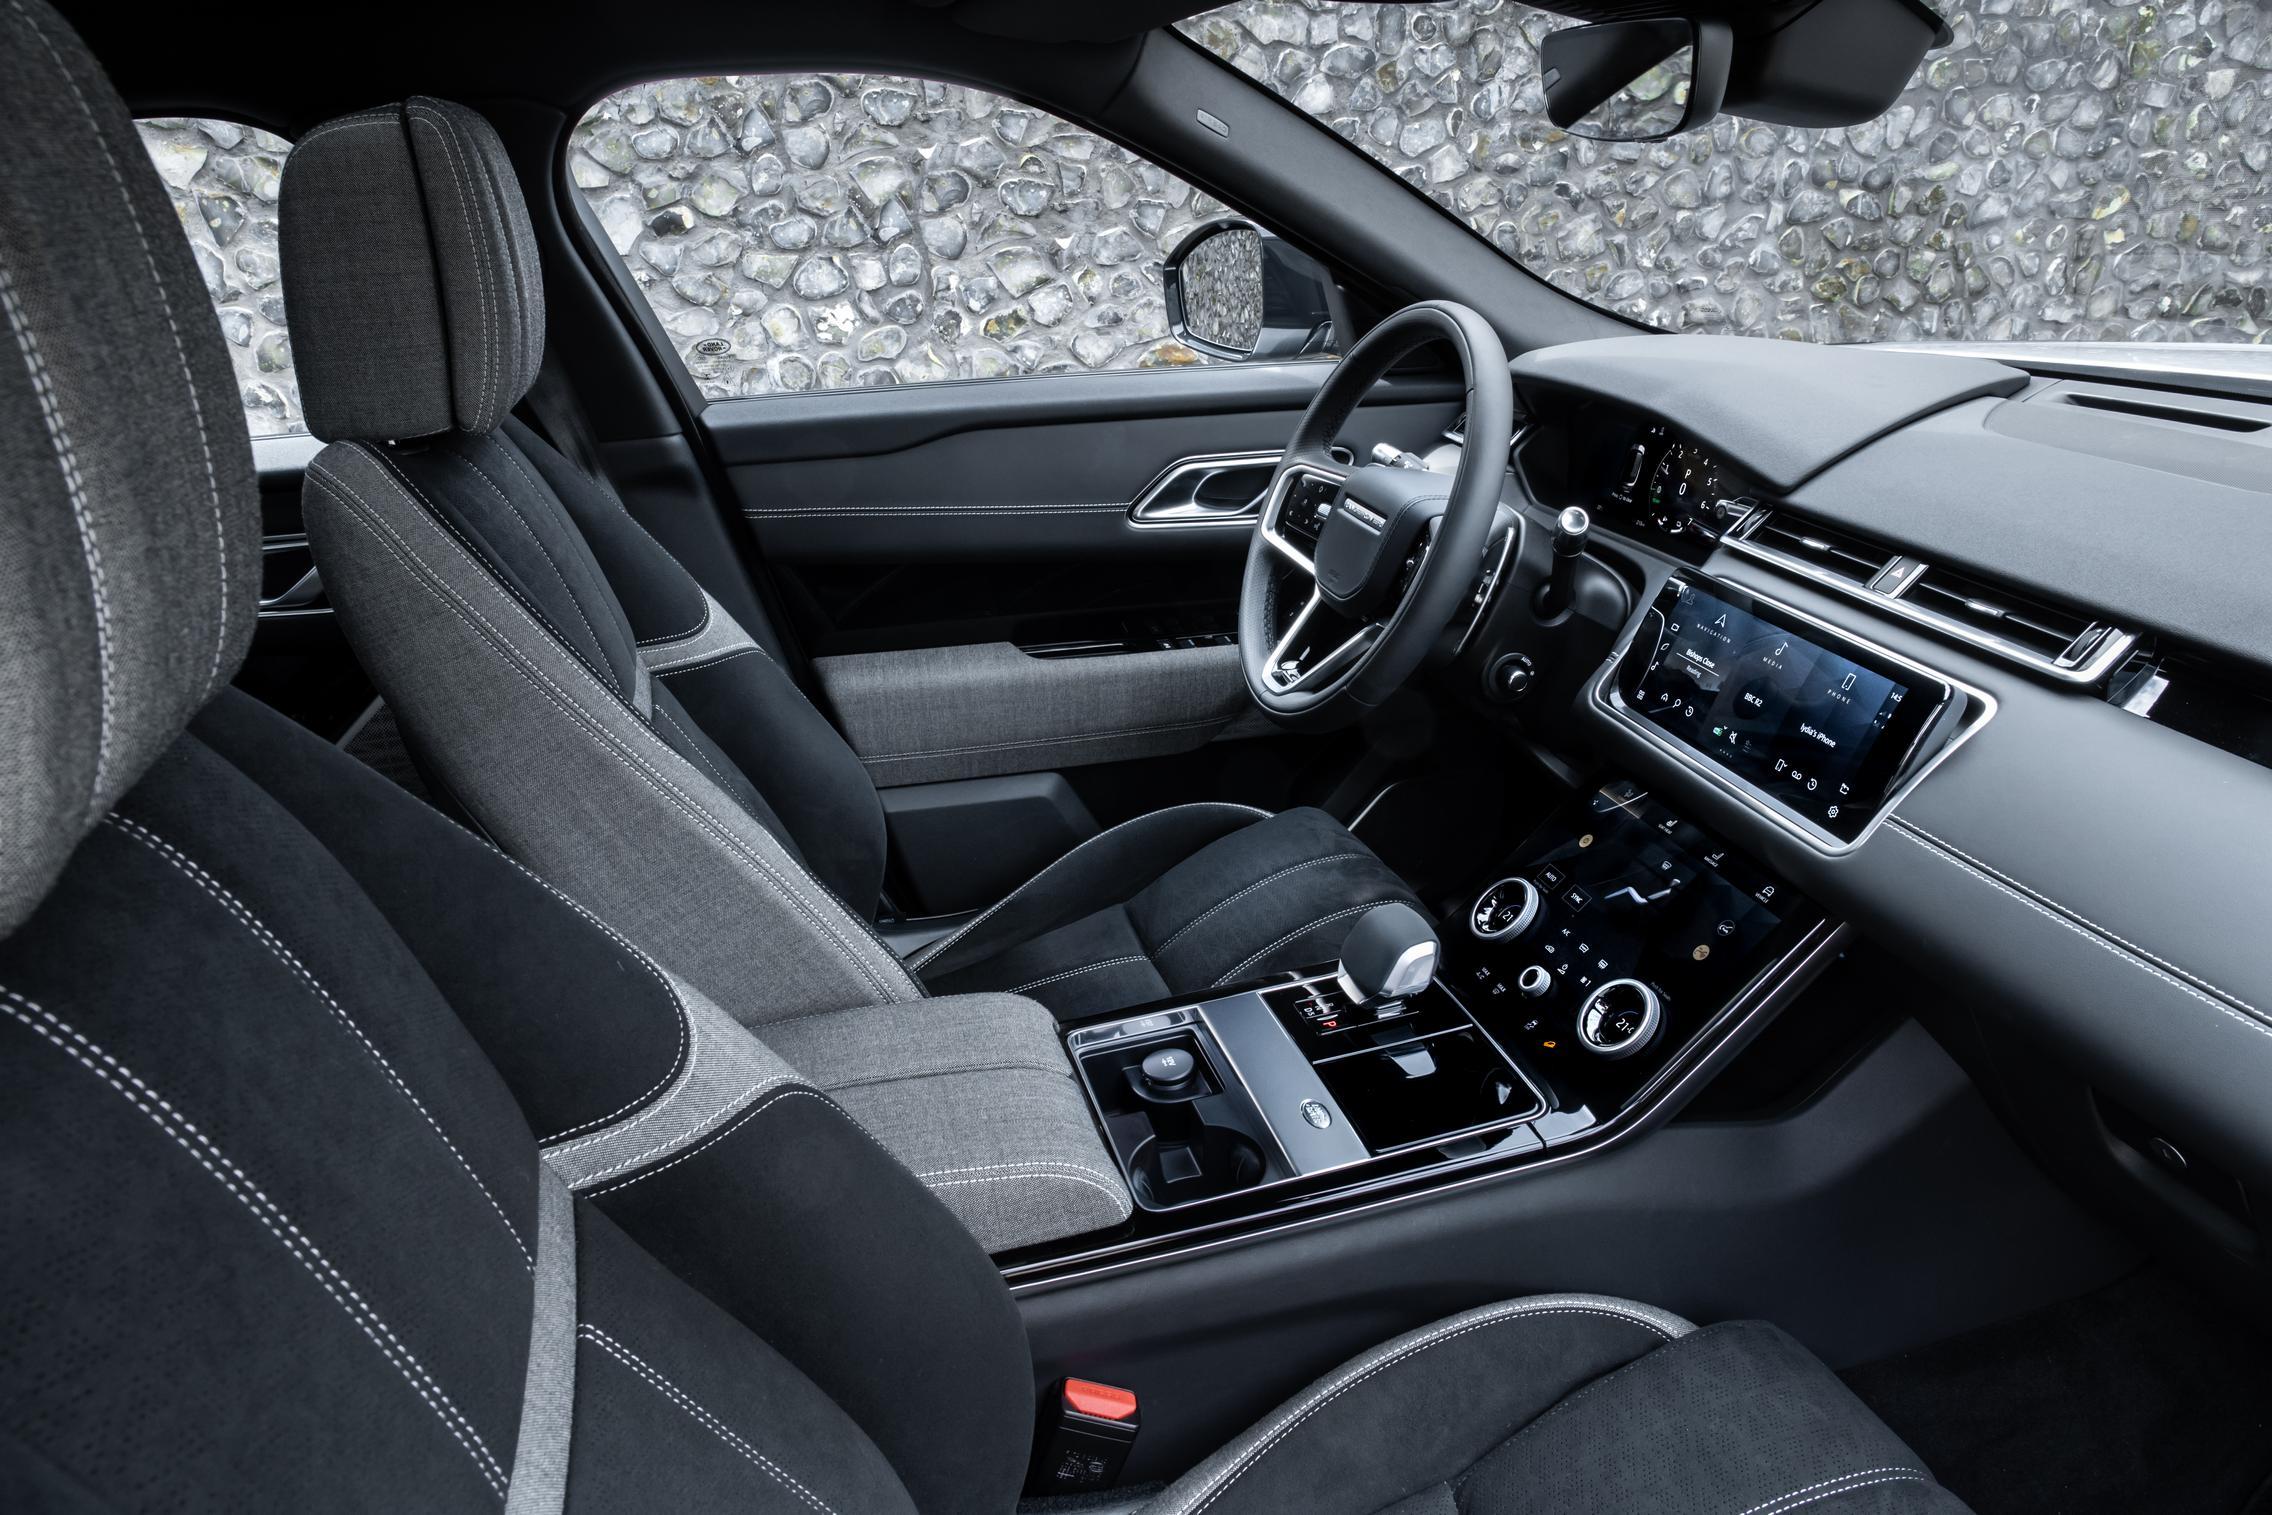 2021 Range Rover Velar Seats